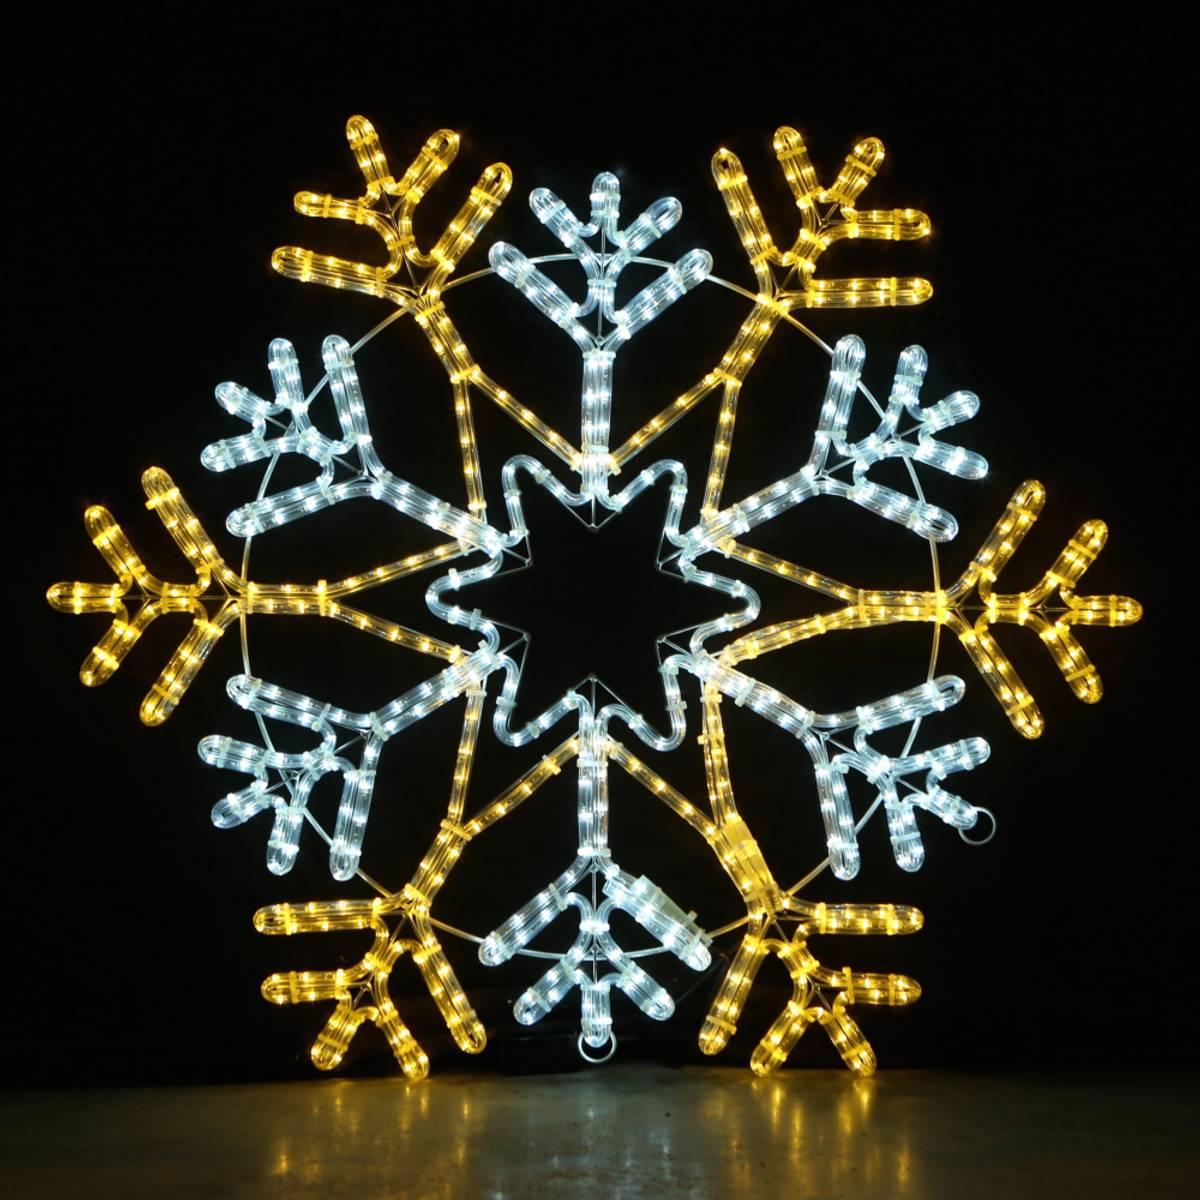 Snøfnugg 90x90cm. 7 ulike lysprogram. Varmhvit og kaldhvit